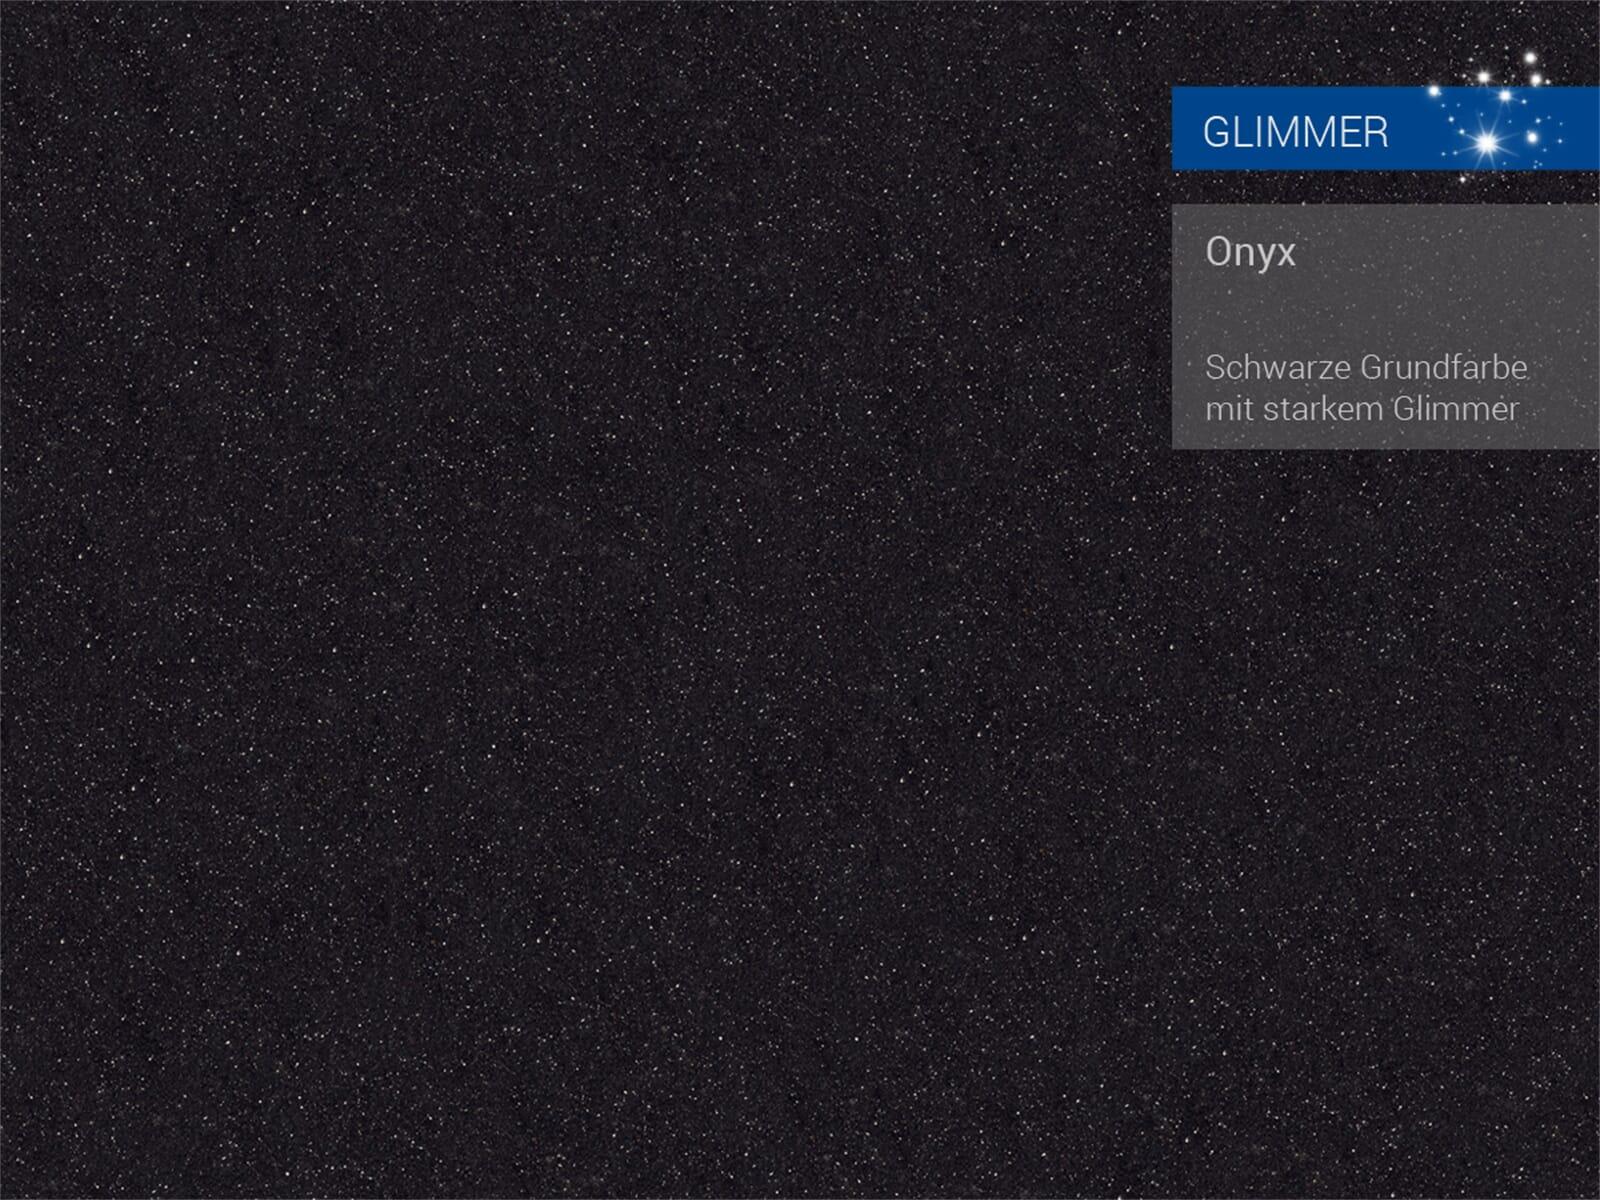 Franke Antea AZG 651 Onyx - 114.0477.967 Granitspüle Exzenterbetätigung